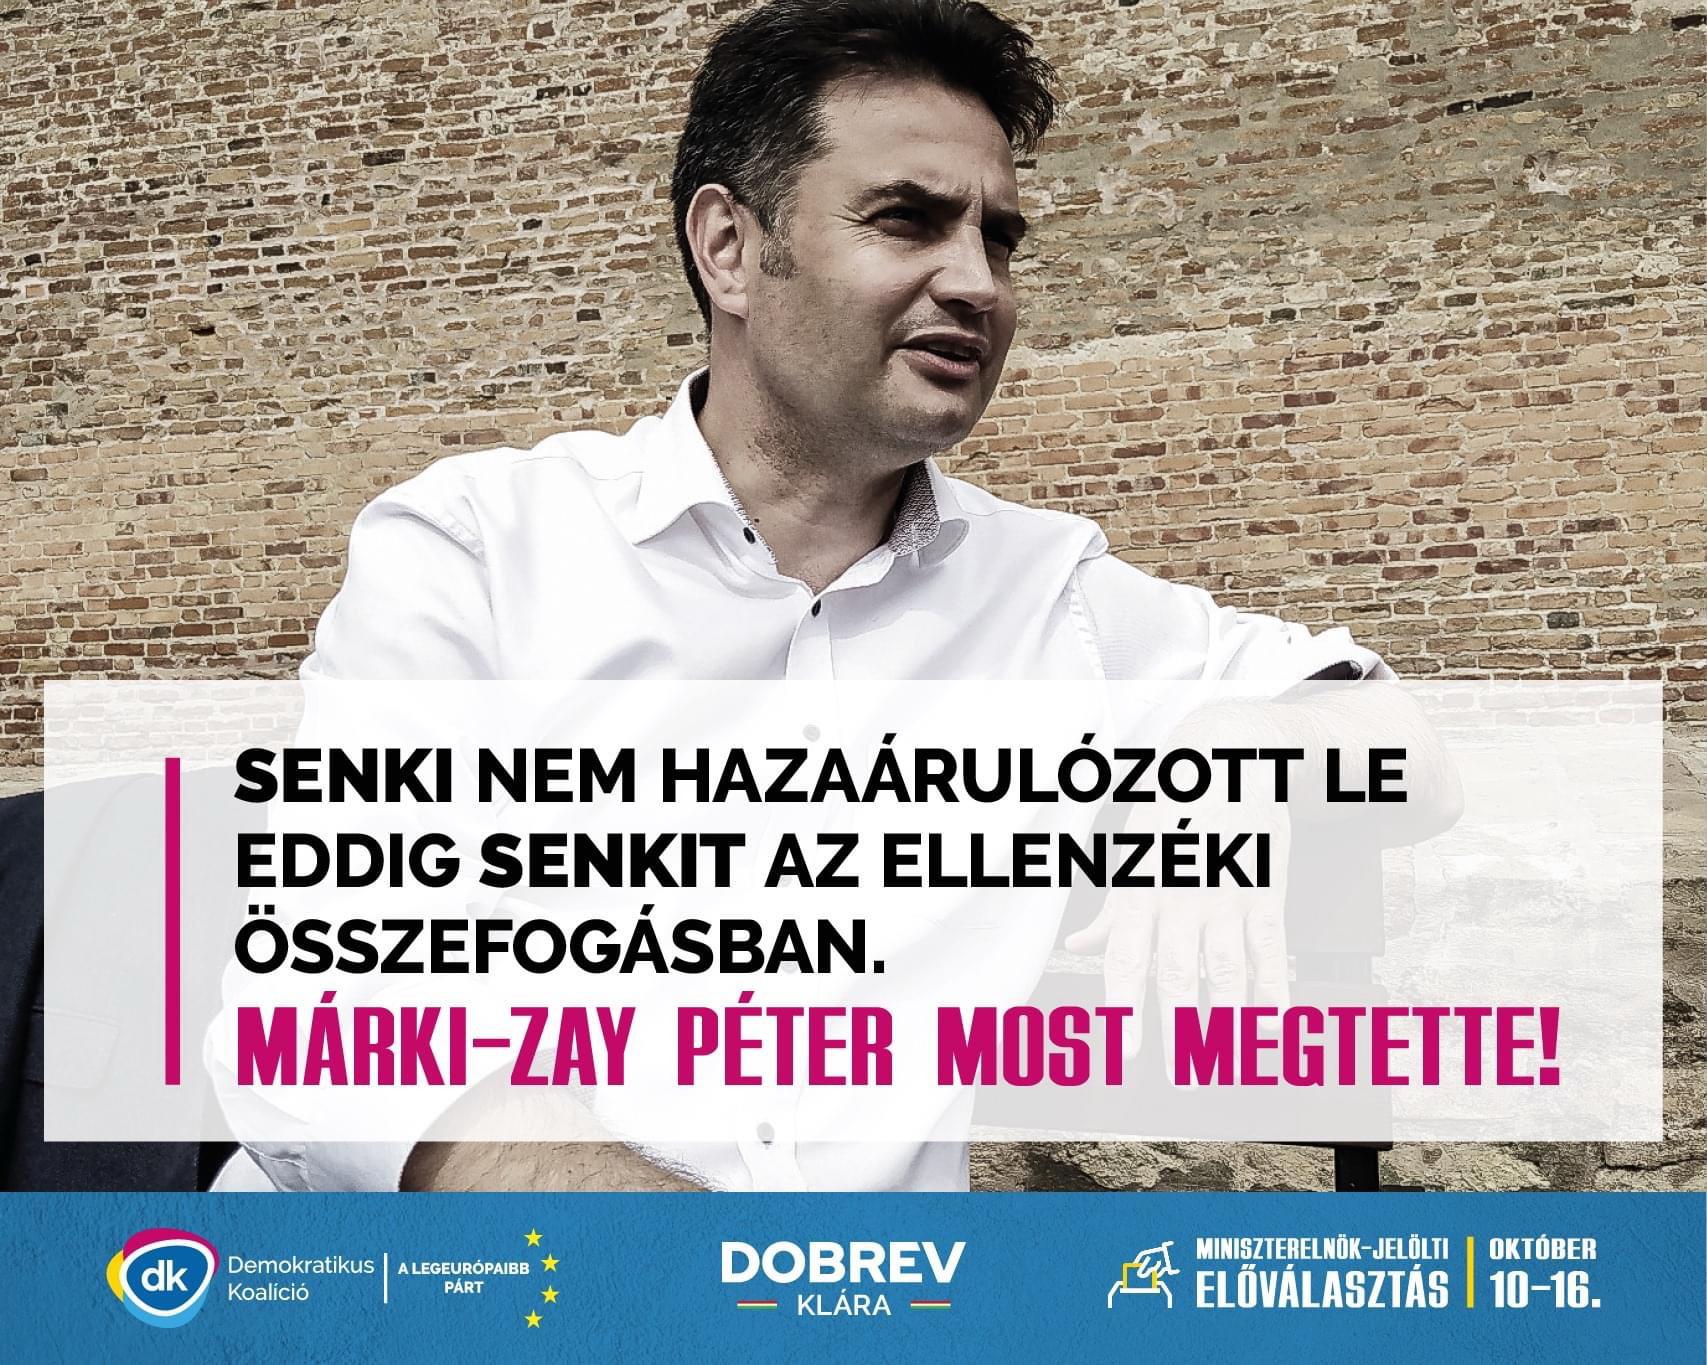 markizayellenesdk-mem2021-10-12.jpg